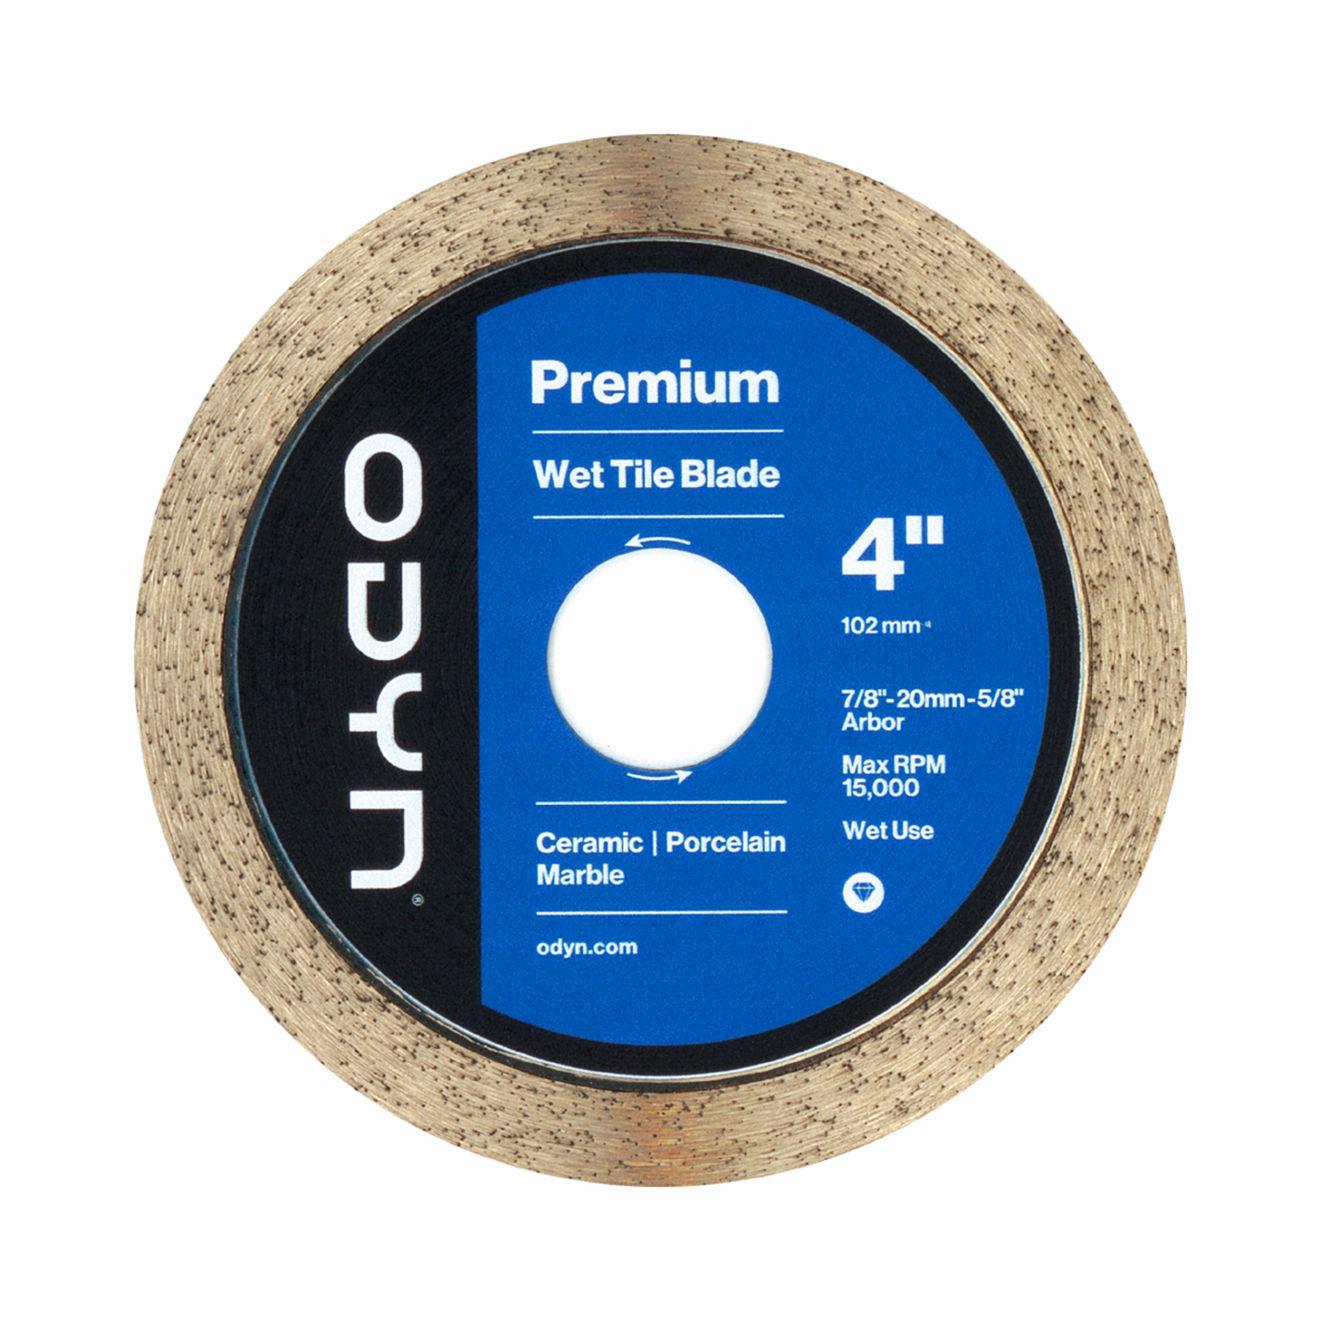 Odyn 4 in. Premium Wet Tile Blade